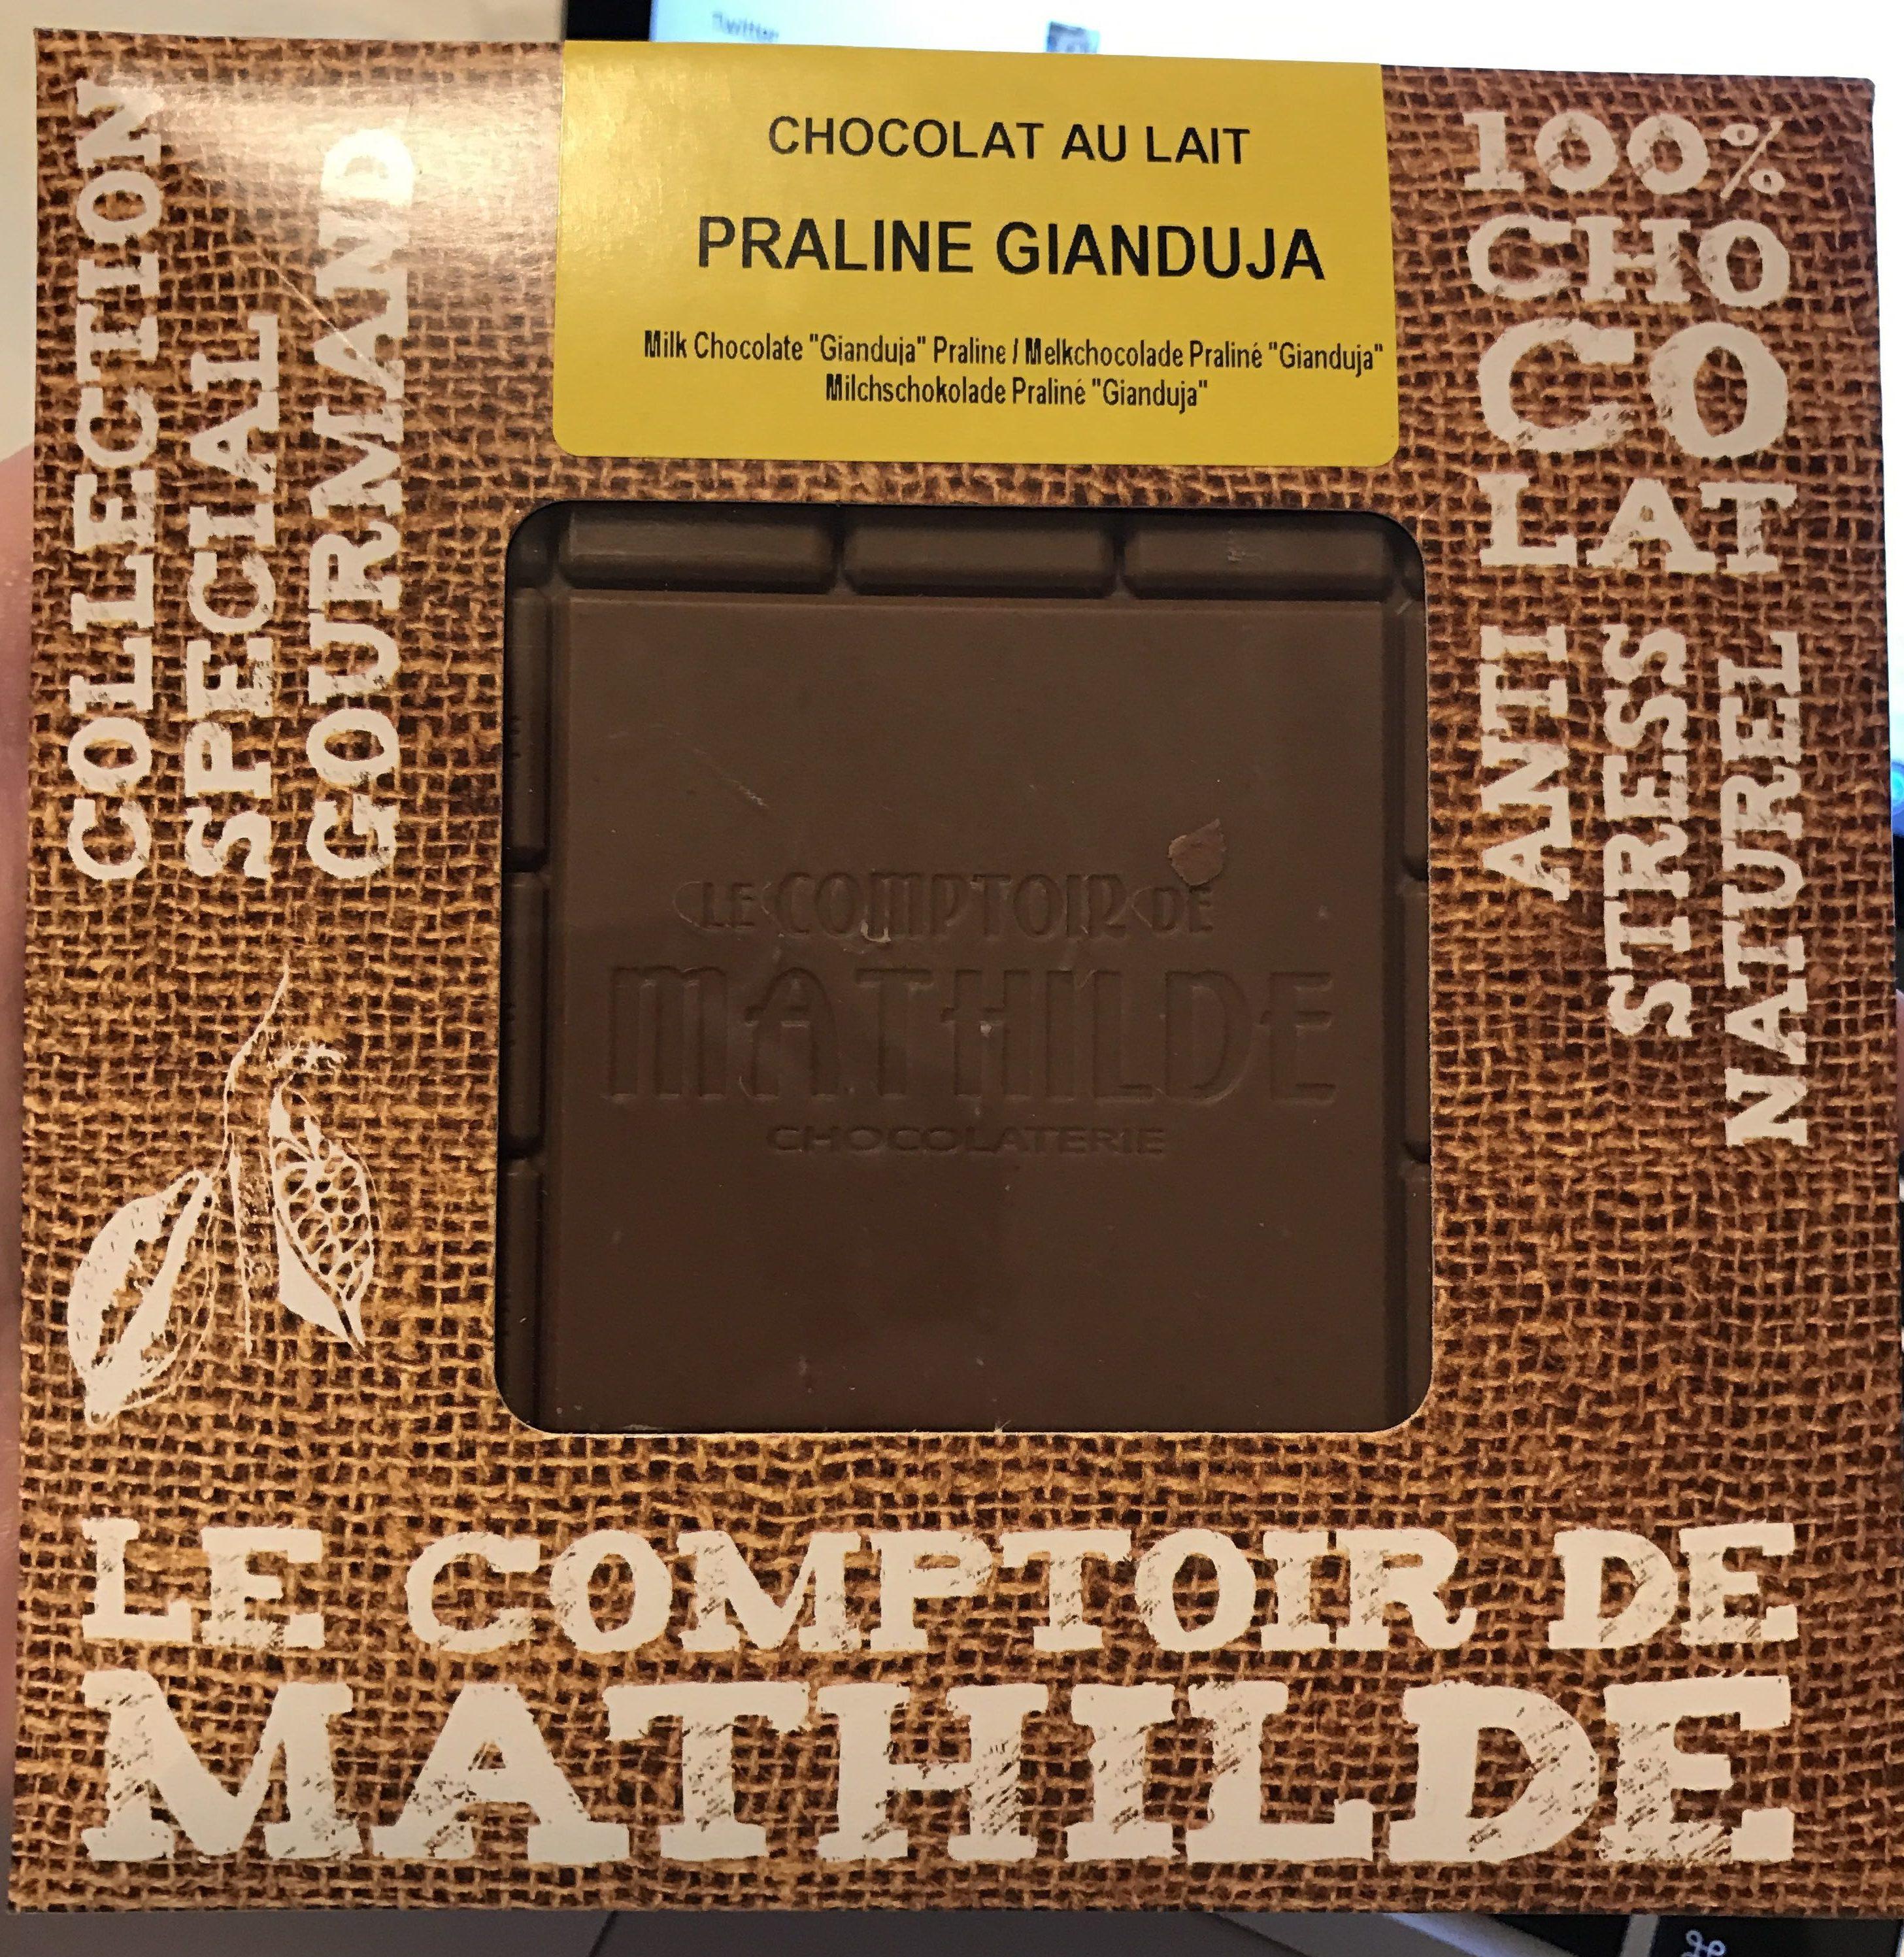 Chocolat au lait Praliné Gianduja - Product - fr